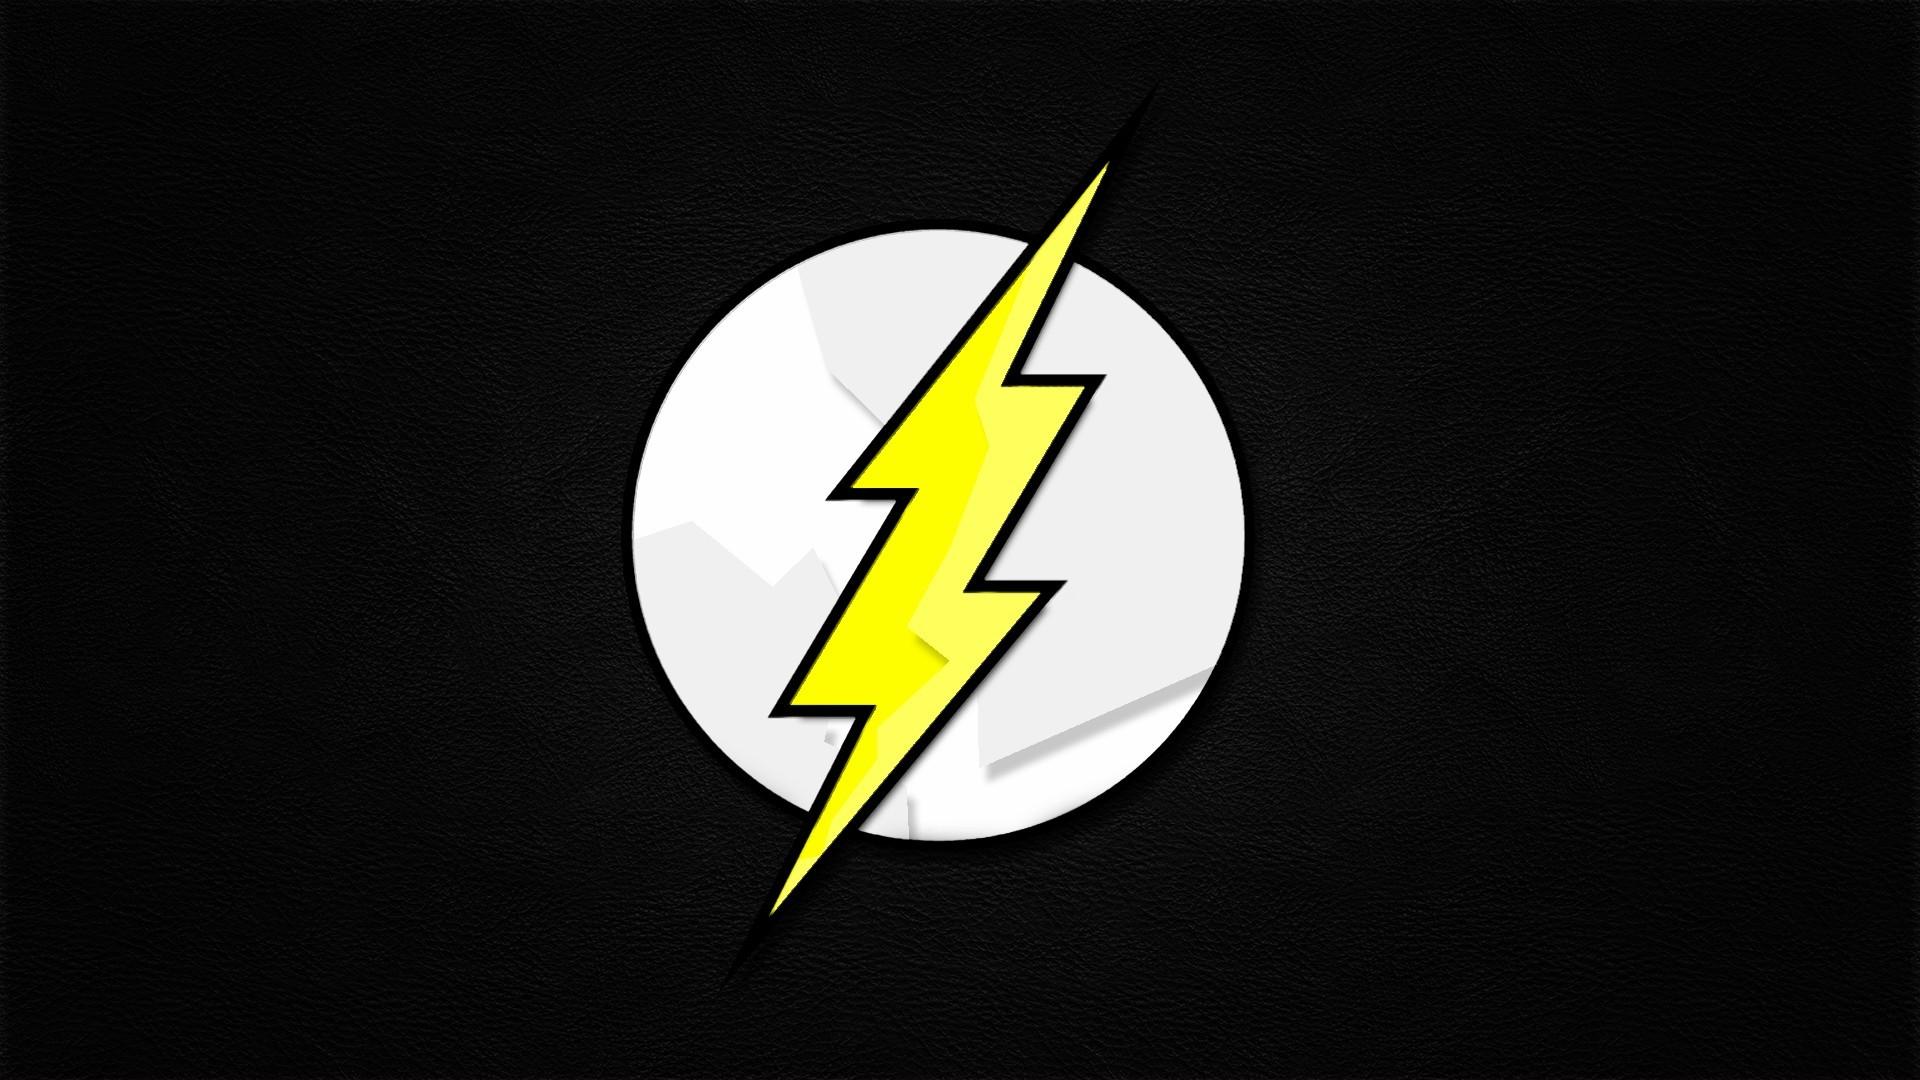 Superhero Logo Wallpapers 59 Pictures